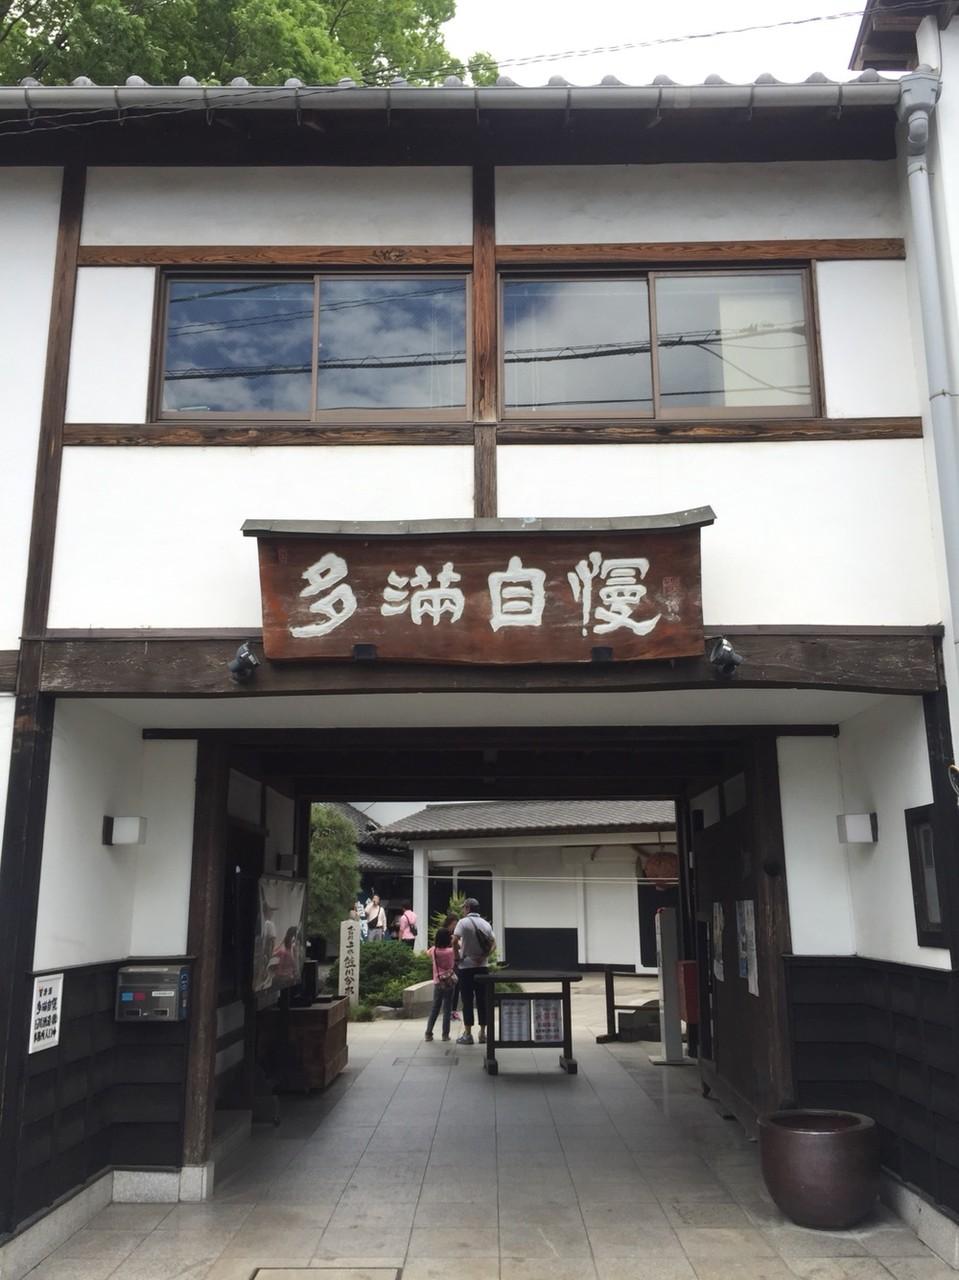 Entrance of Ishikawa Brewery Tokyo Fussa